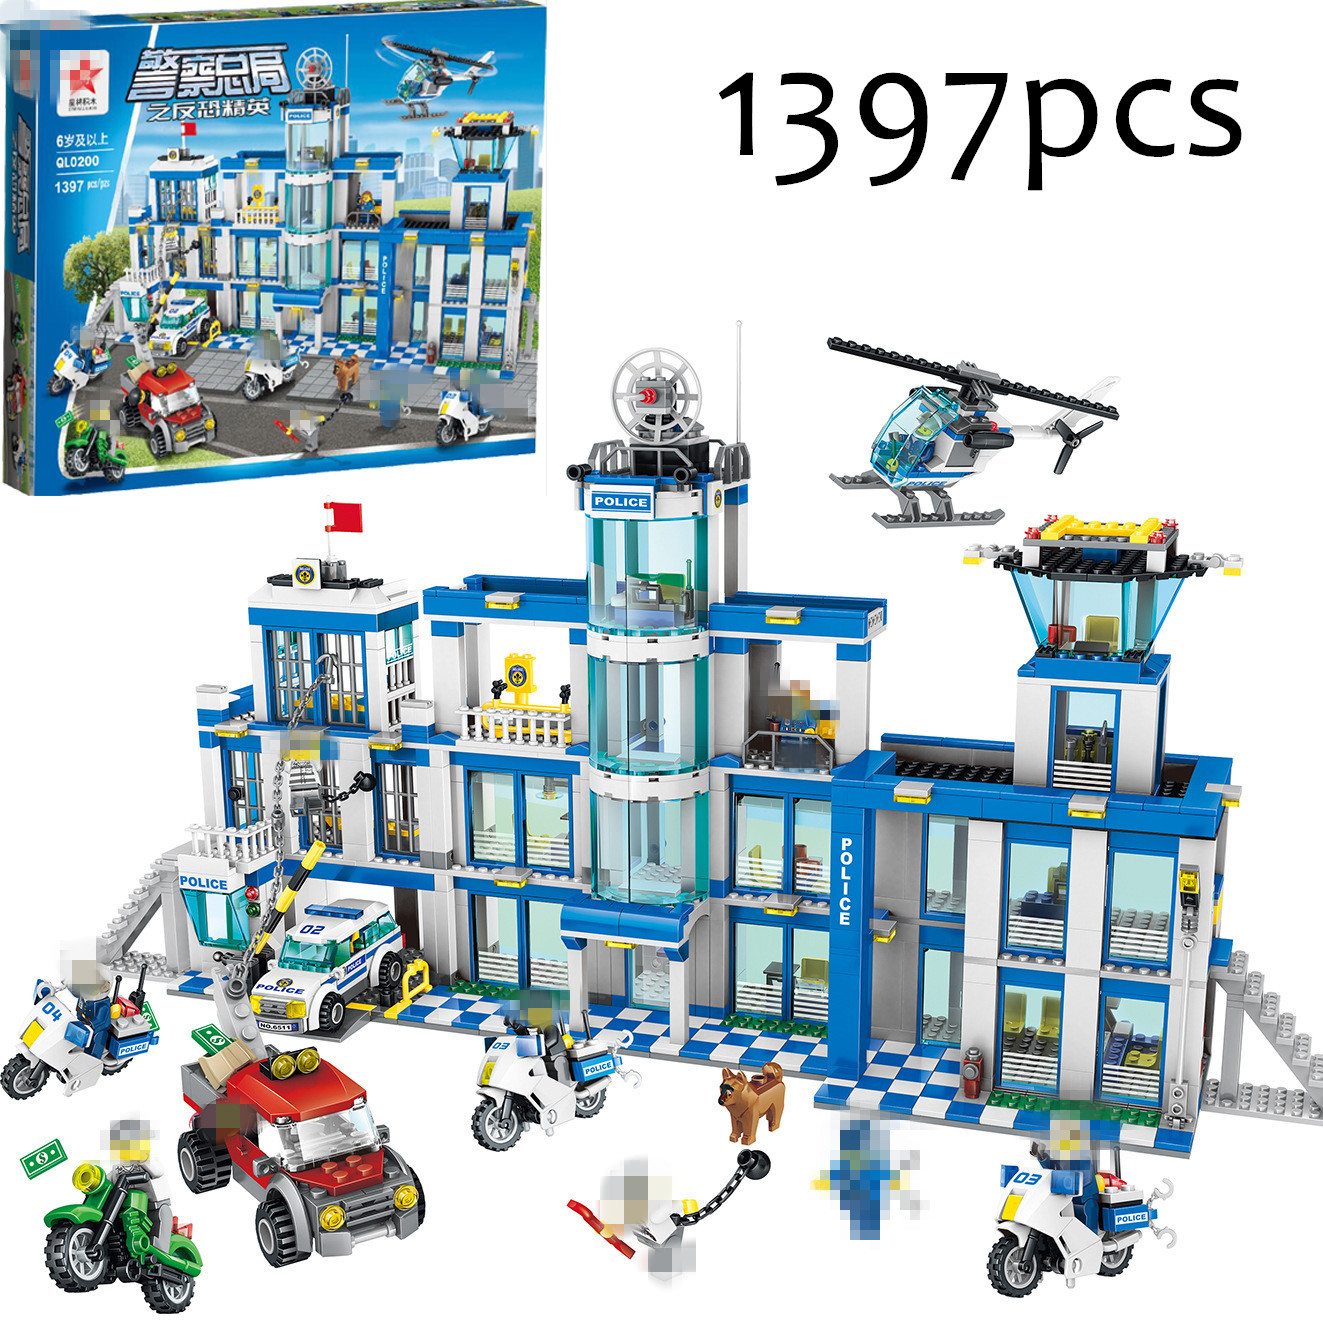 City Police Series Building Blocks Set Motorbike Car Helicopter Police Station Model Brick Toys For Children Boys